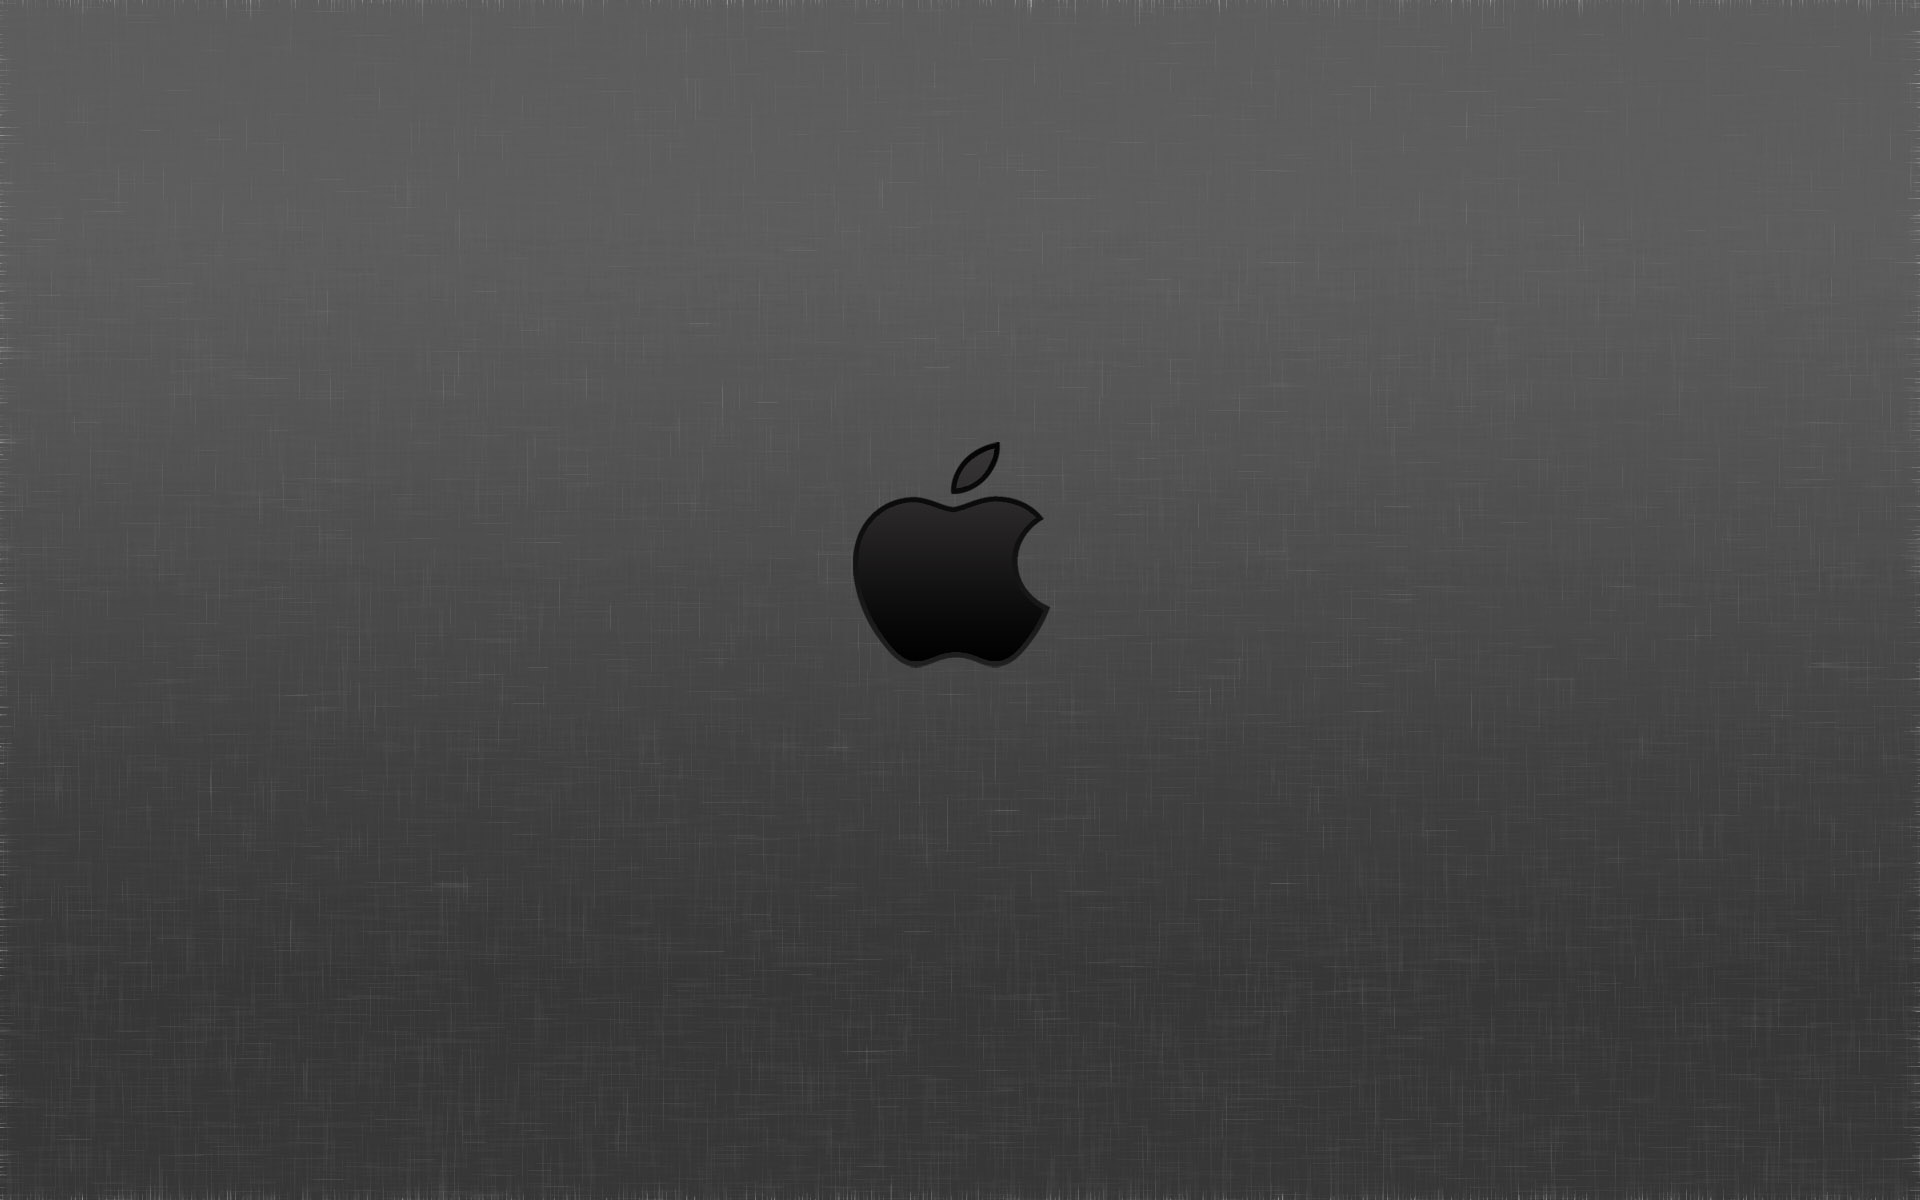 Keith Haring Iphone Wallpaper Logo Apple Free Wallpaper World